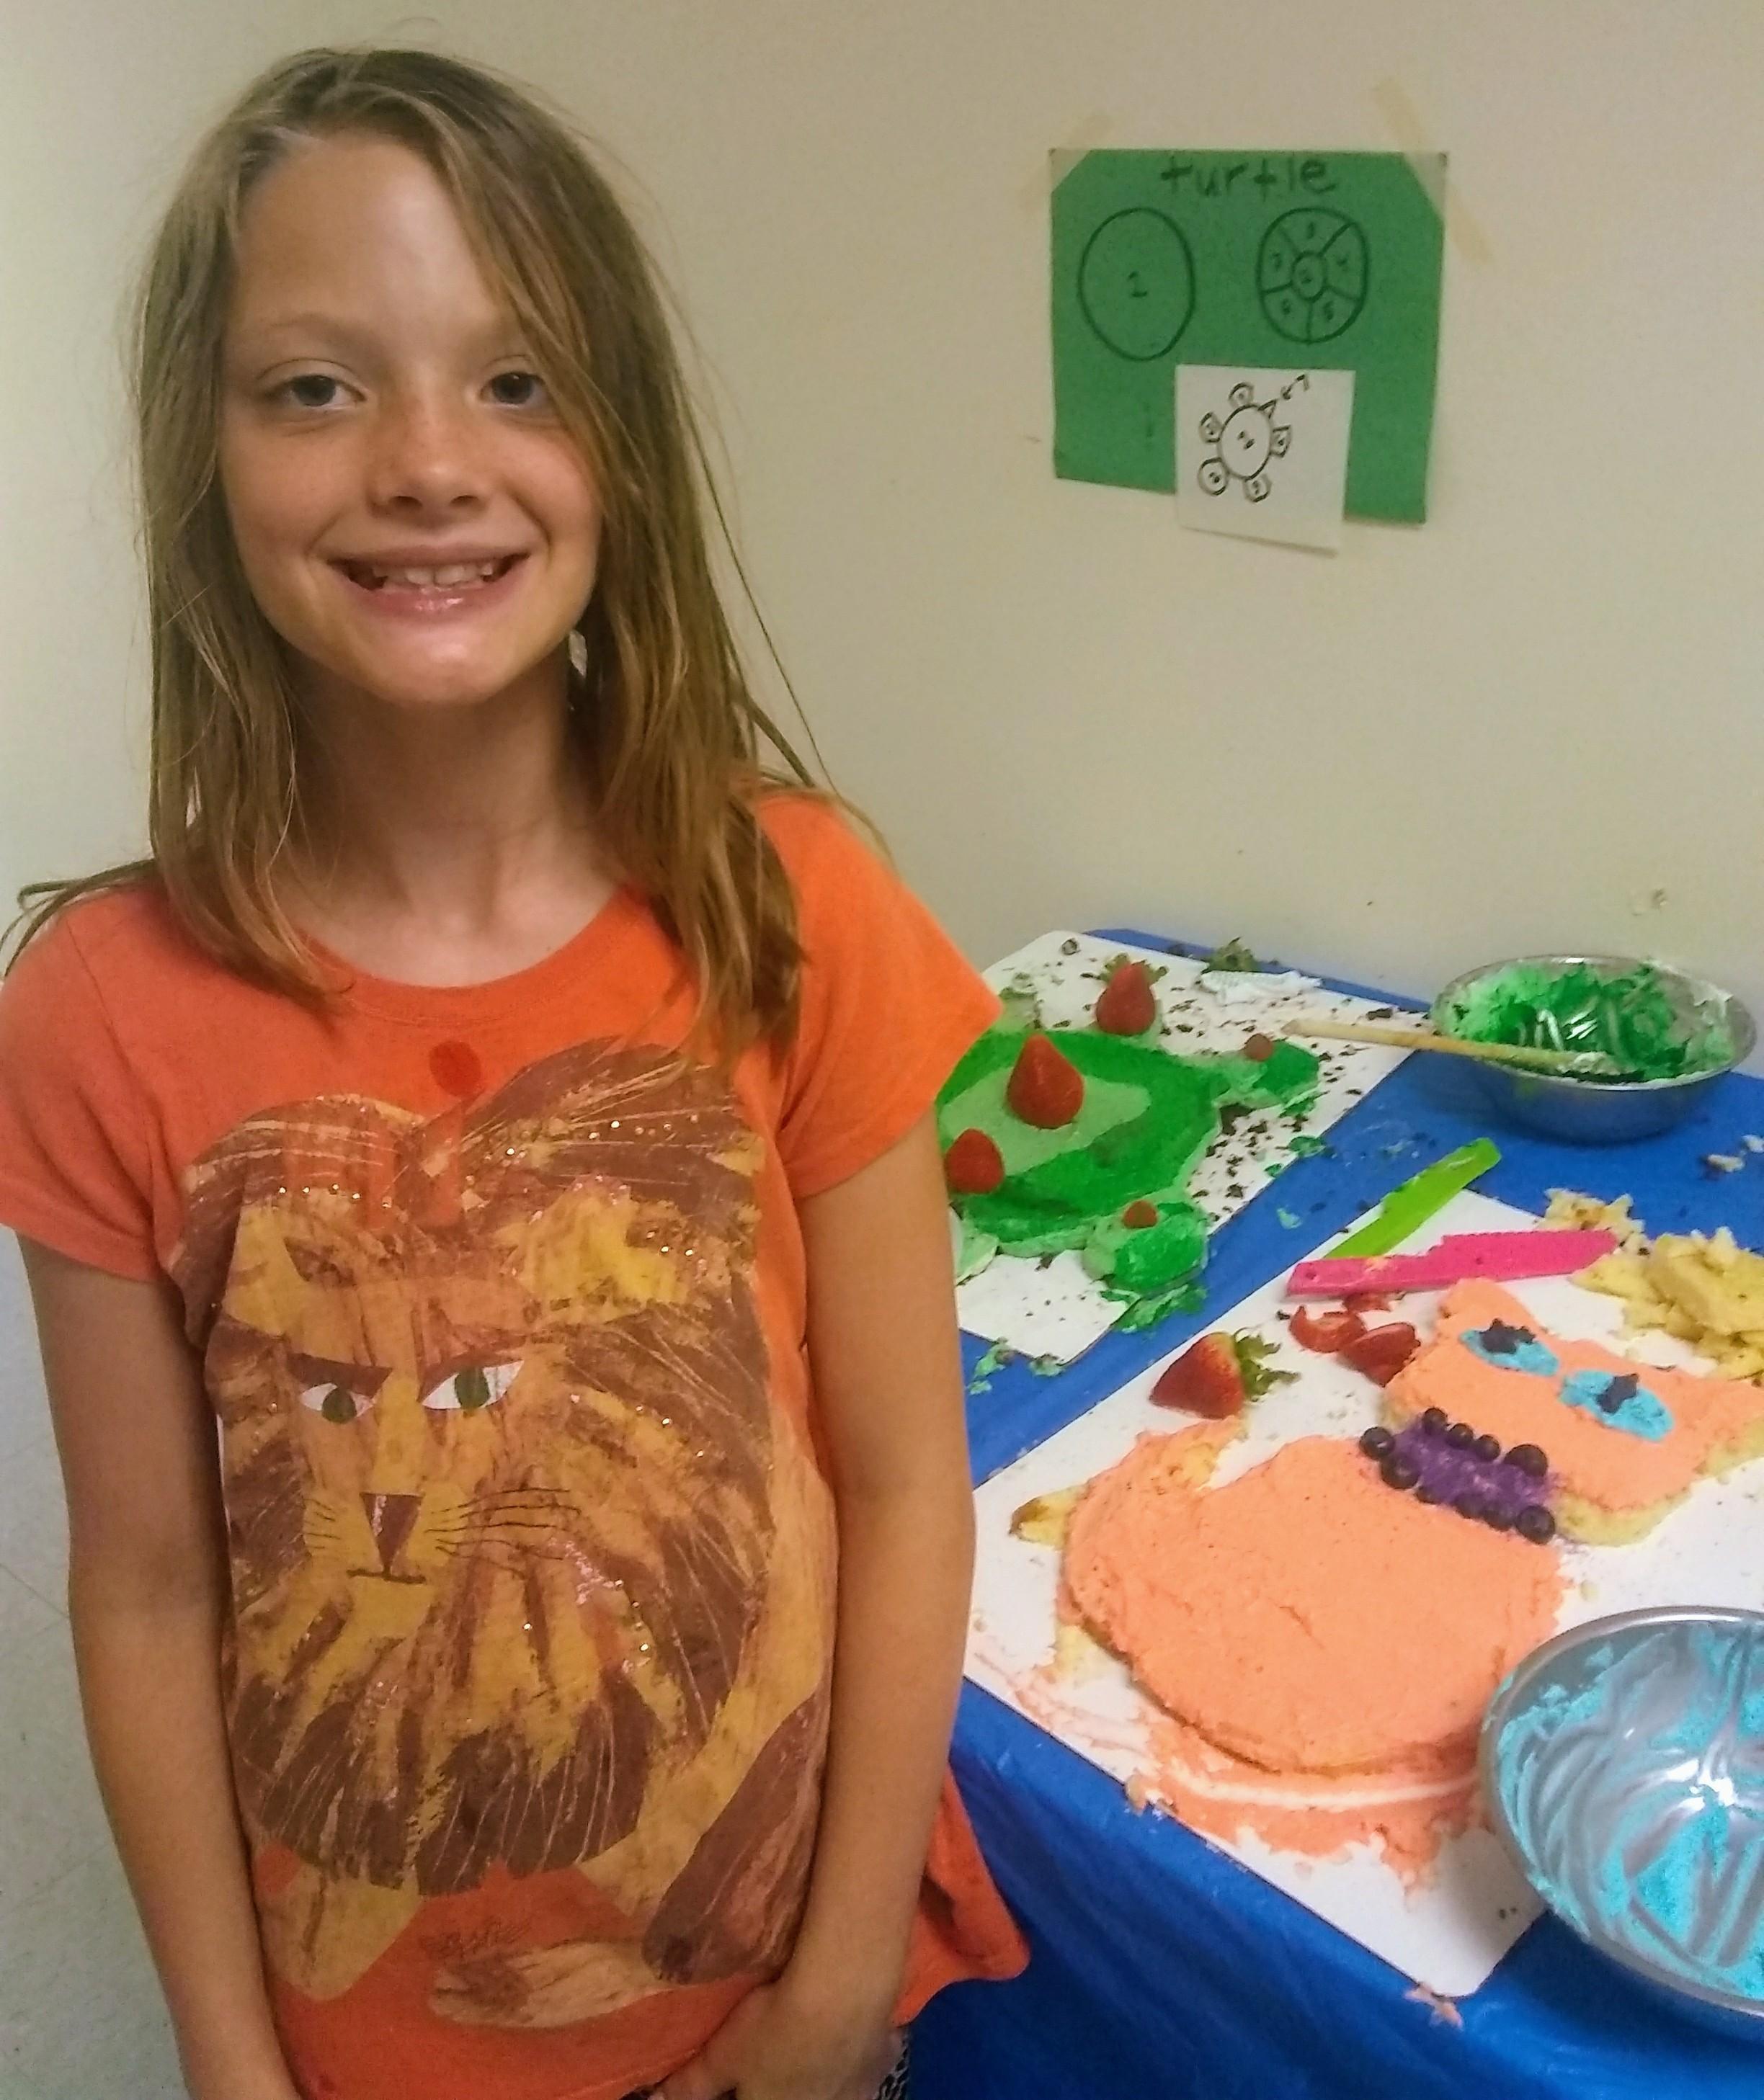 a cat shaped cake